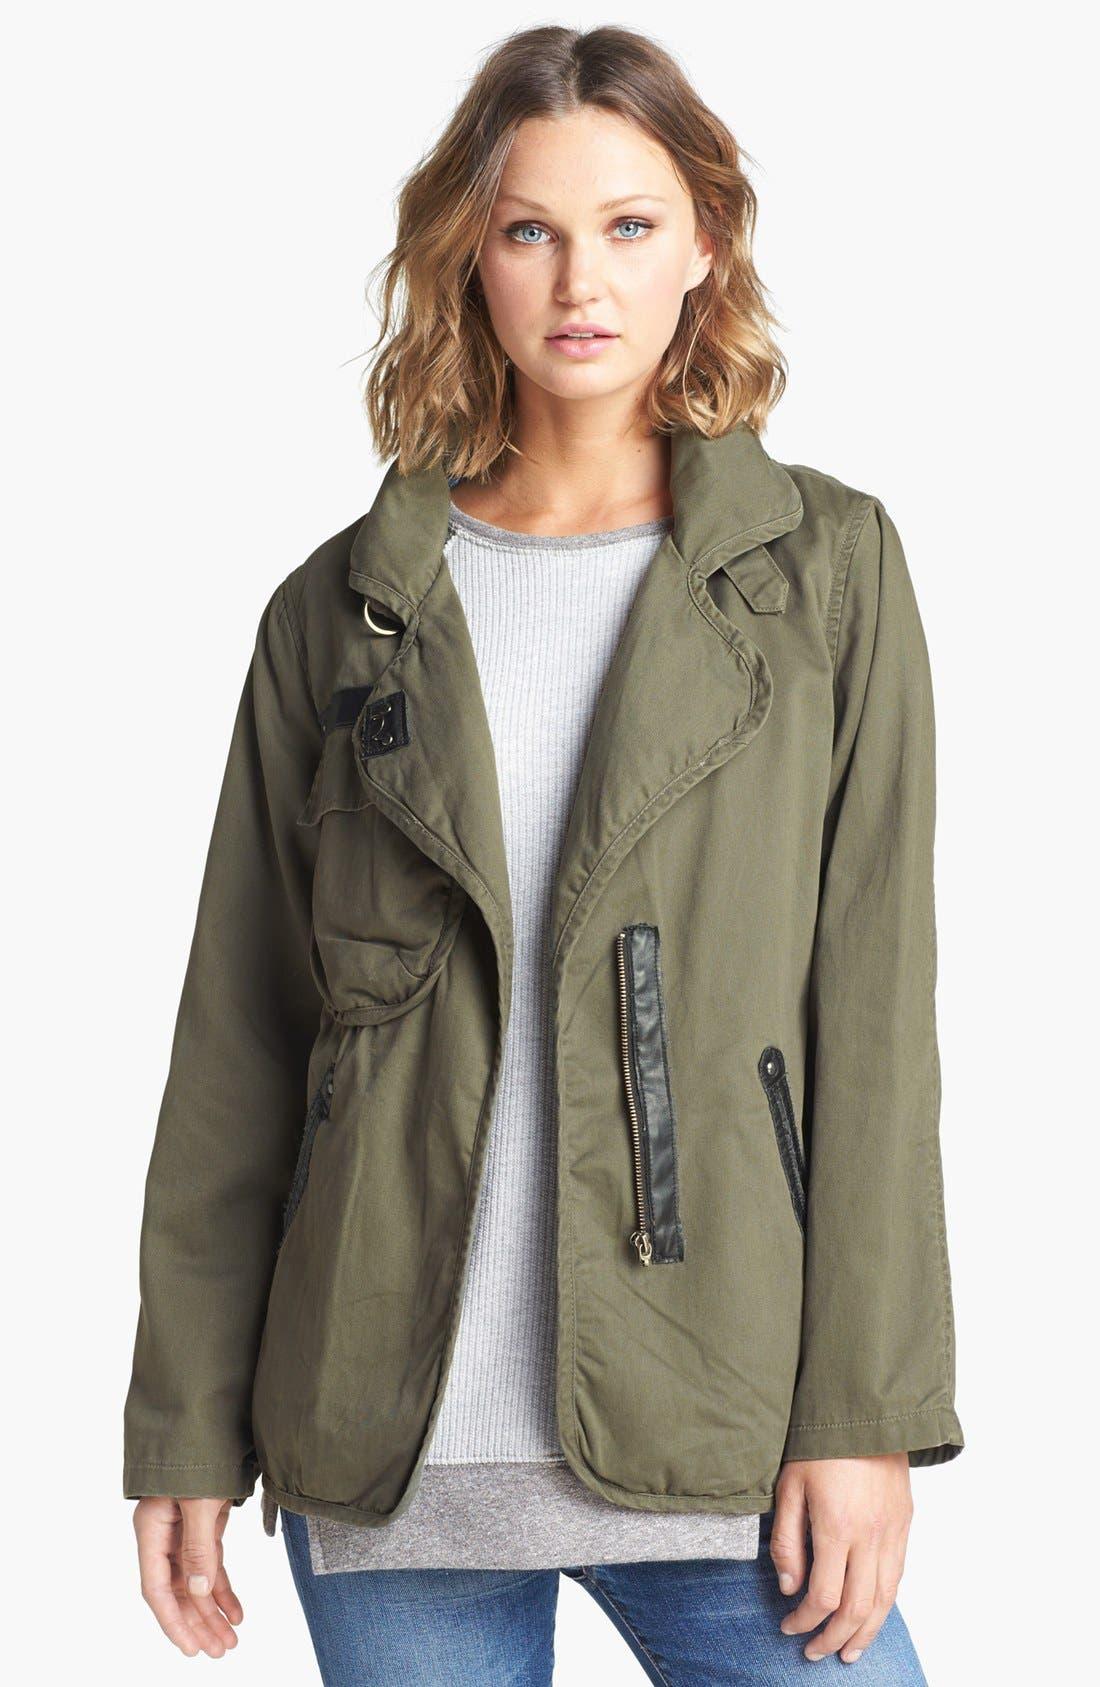 Main Image - Sanctuary Army Jacket